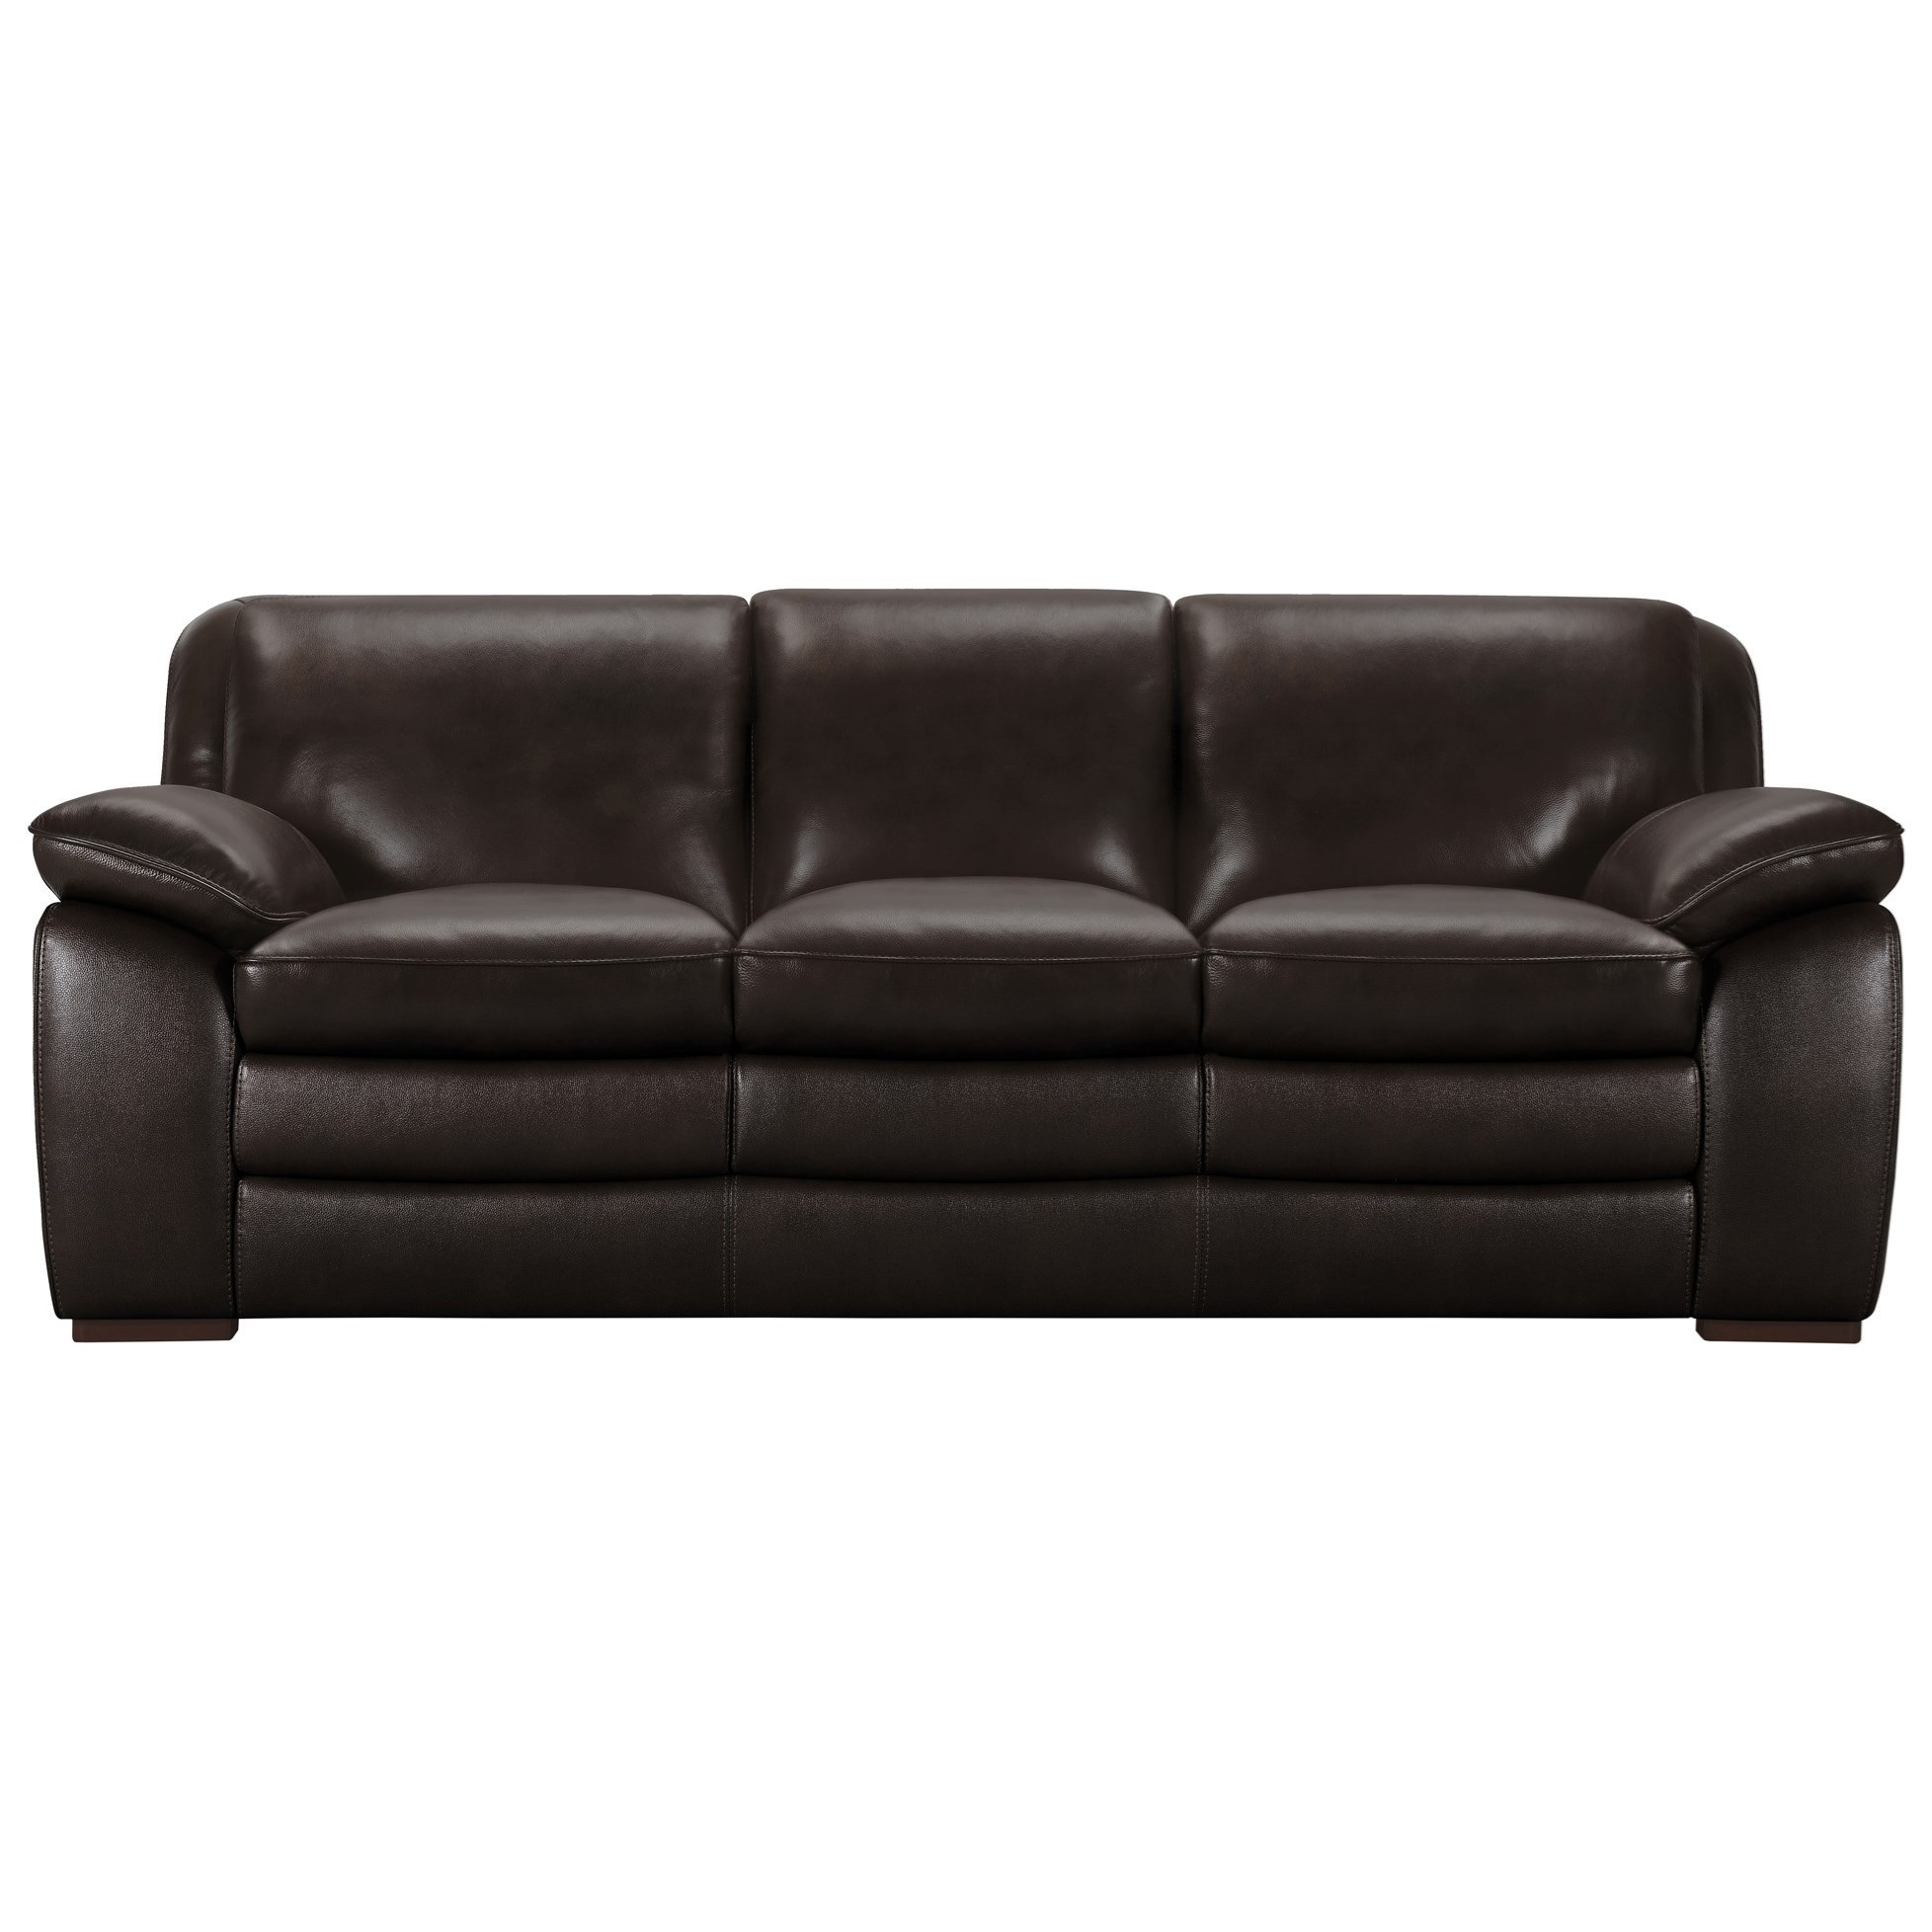 Zanna Sofa by Armen Living at Dream Home Interiors